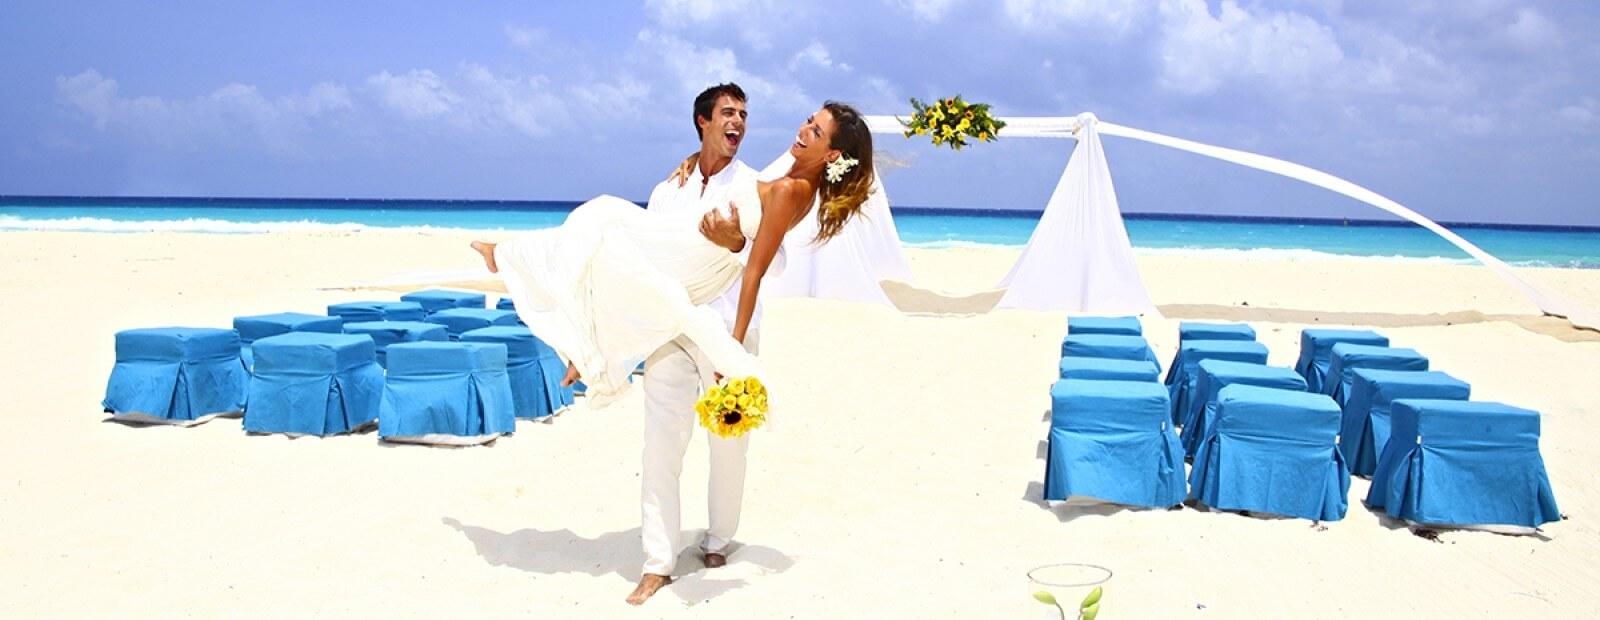 Weddings Playa del Carmen